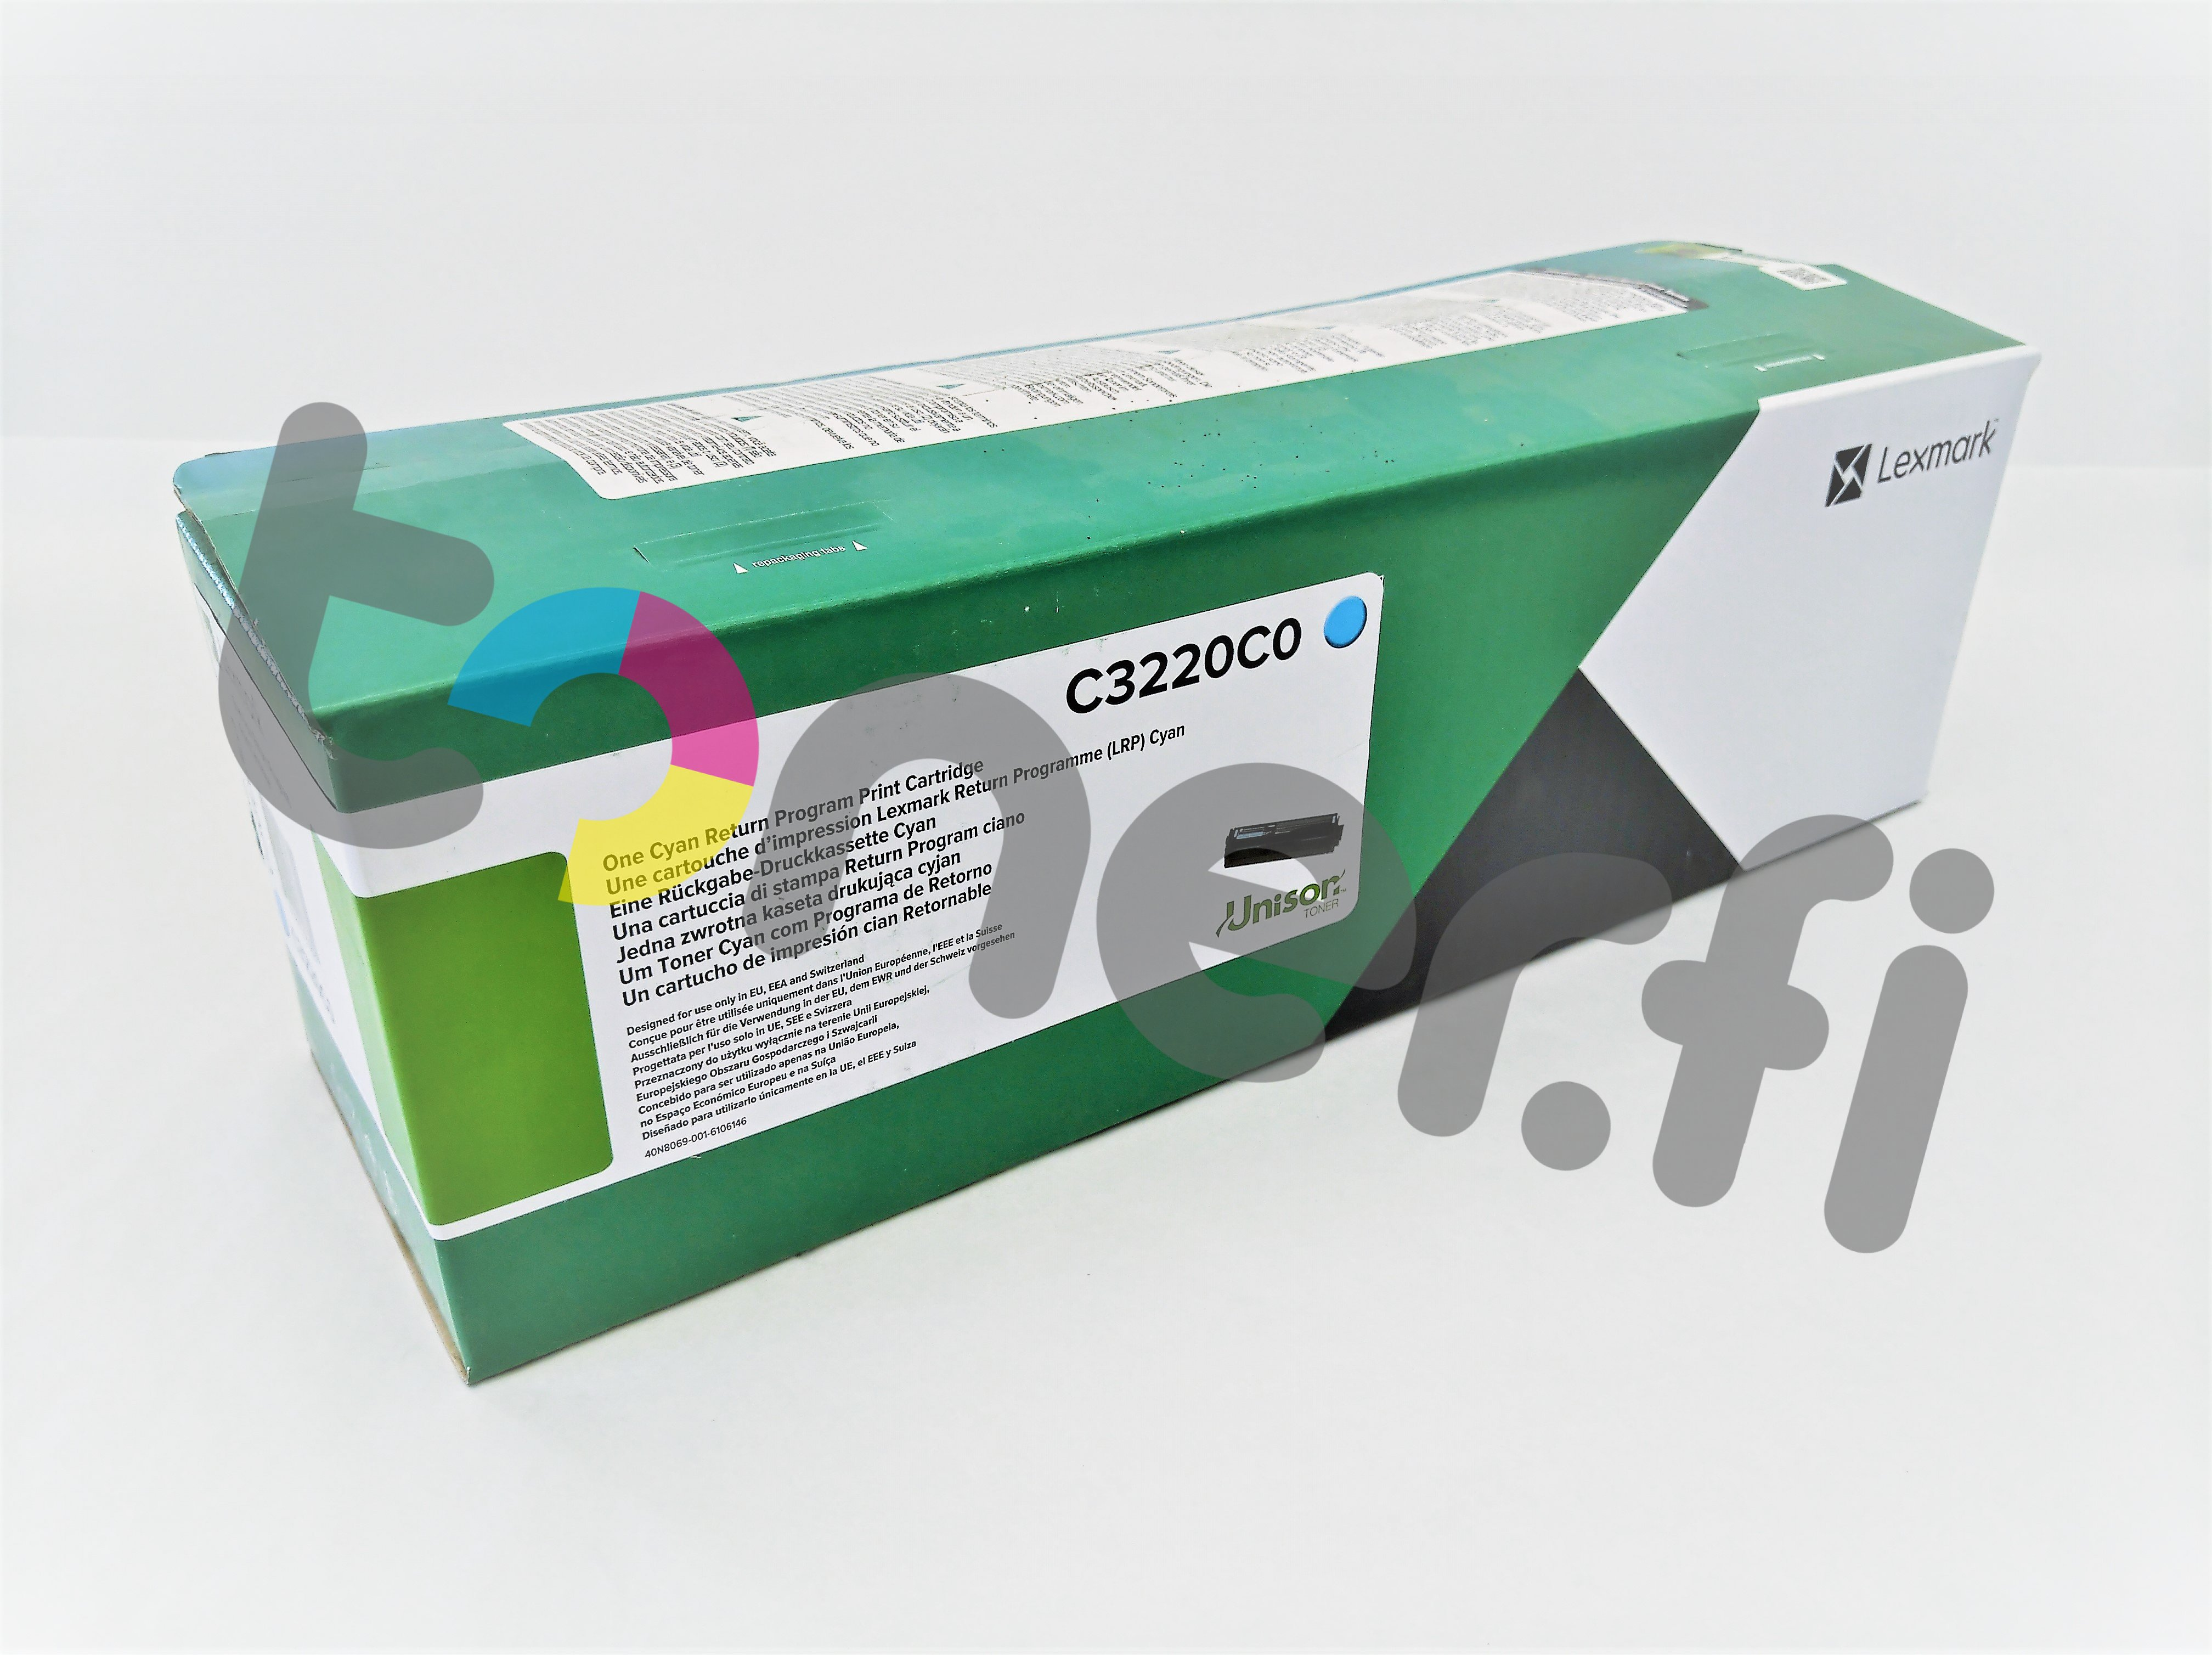 Lexmark C3224 Värikasetti Sininen C3220C0